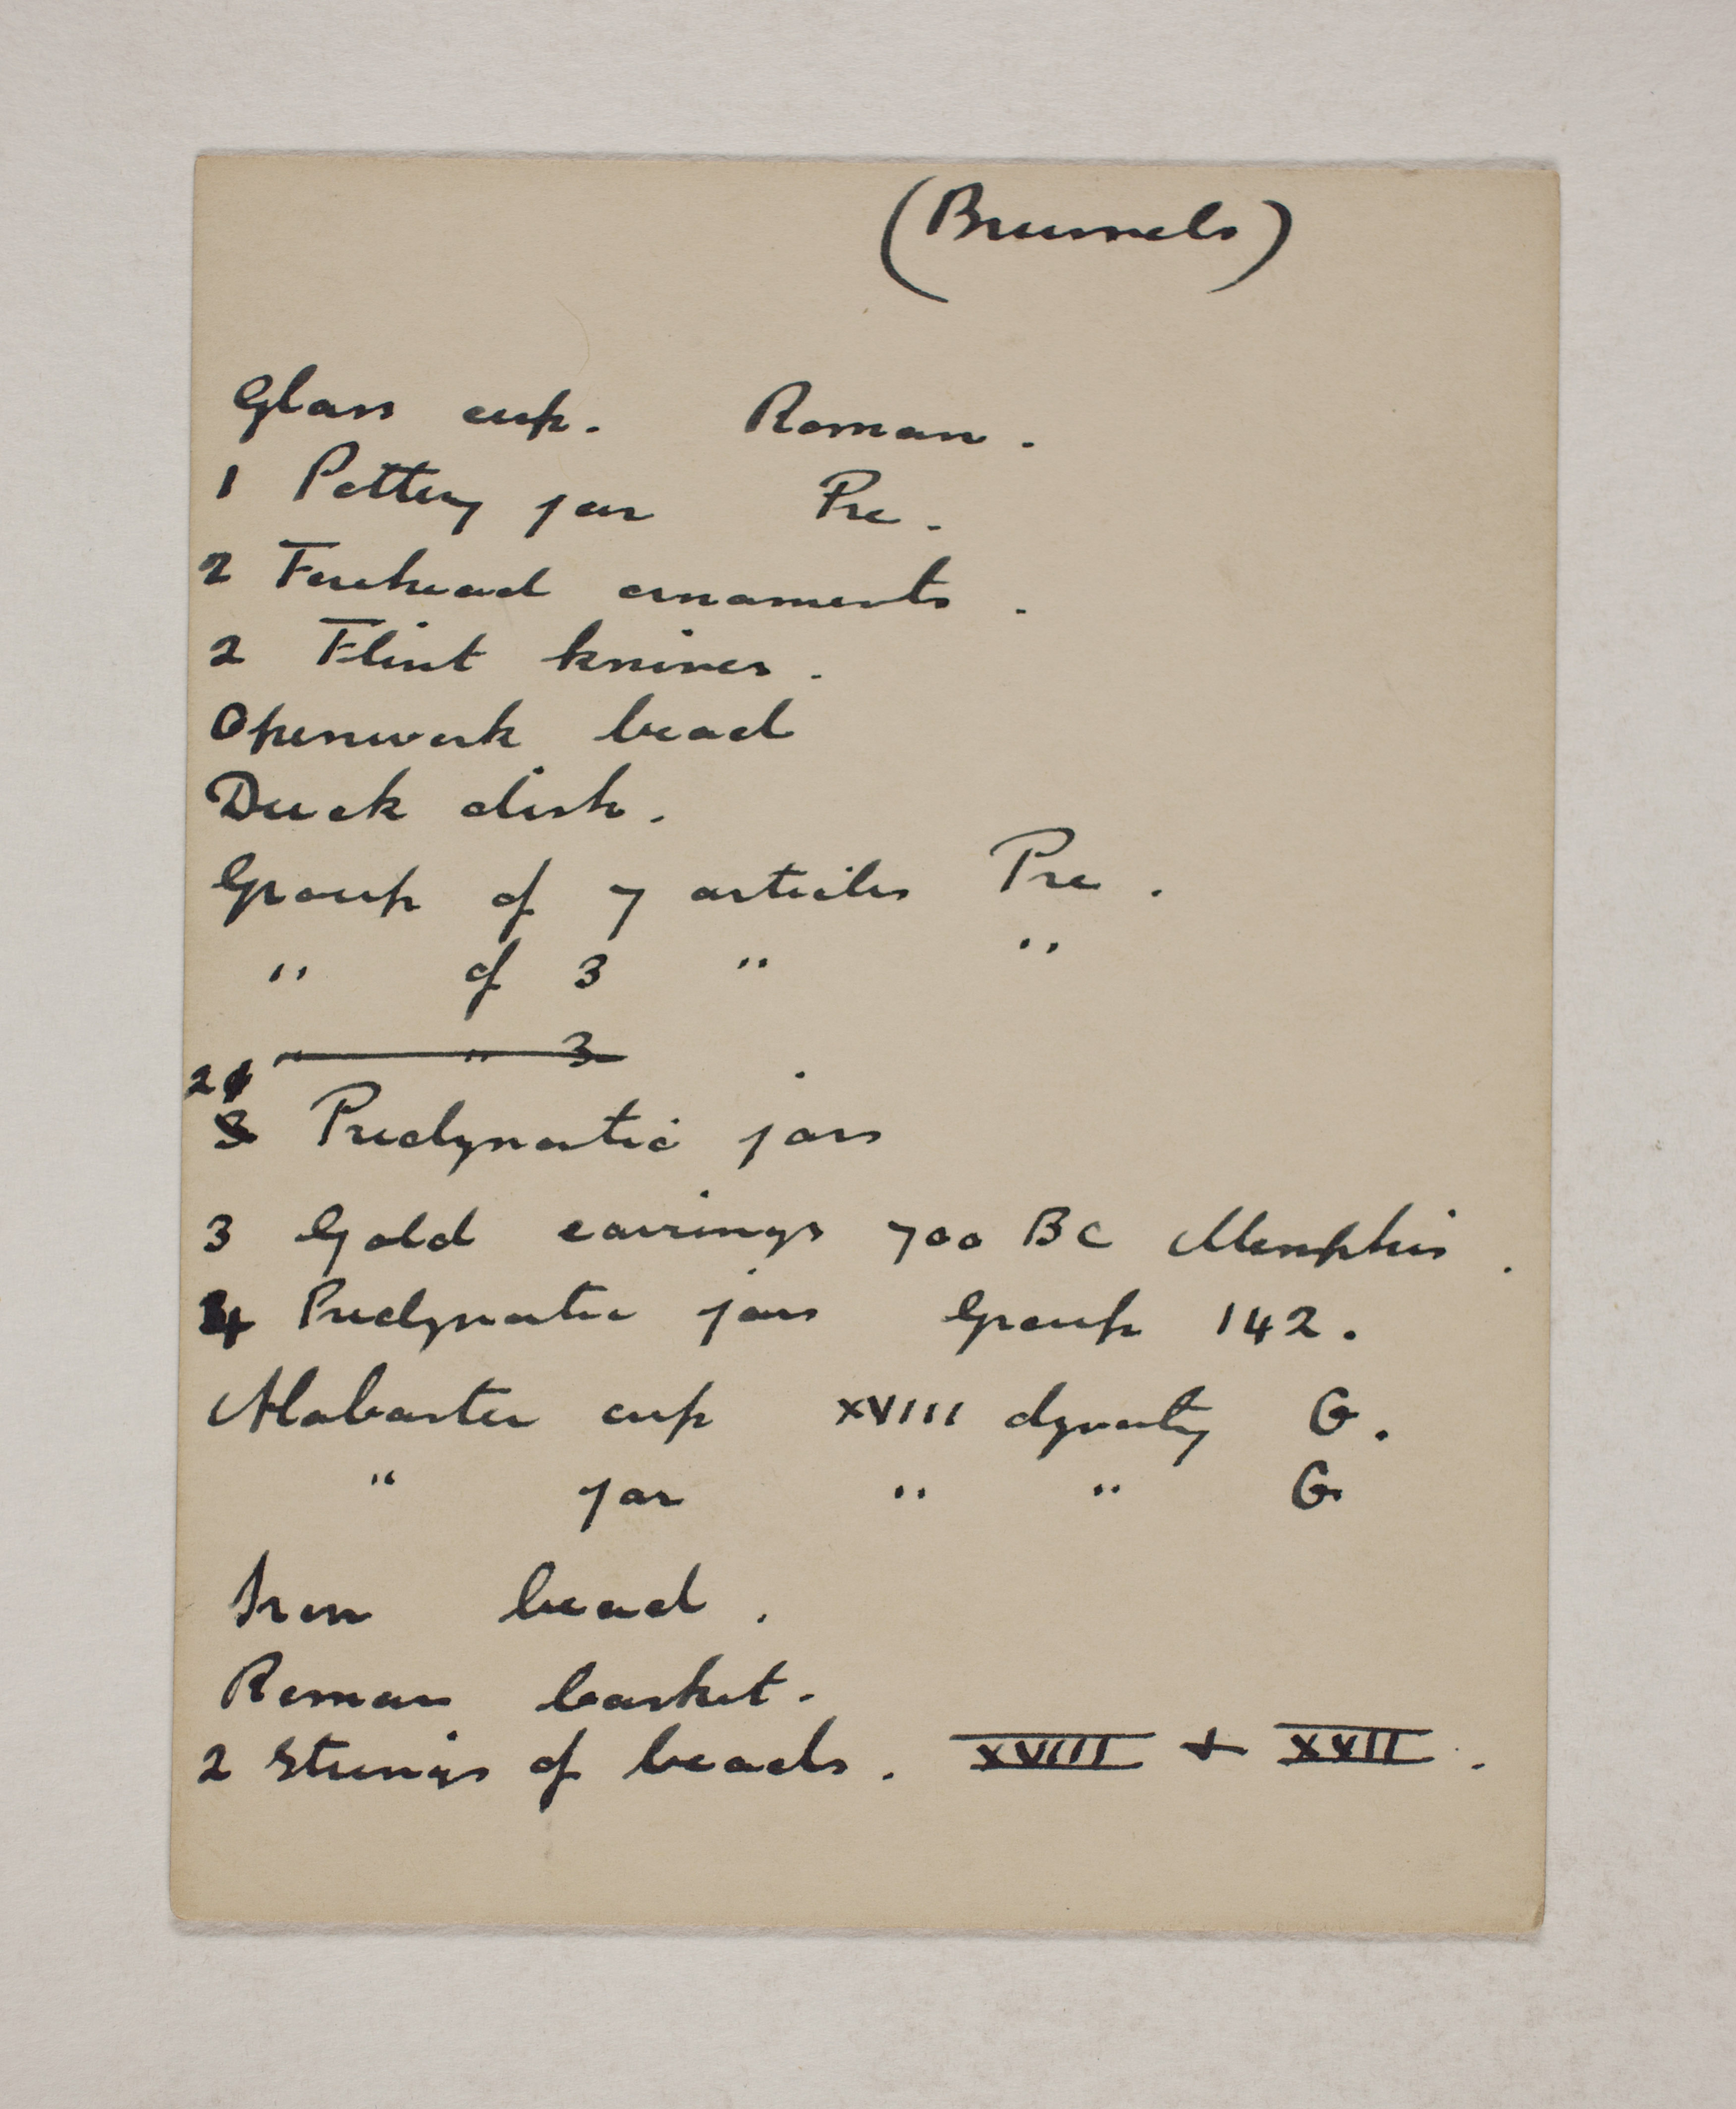 1910-11 Hawara, Gerzeh, Memphis, Mazghuneh Individual institution list  PMA/WFP1/D/19/18.1